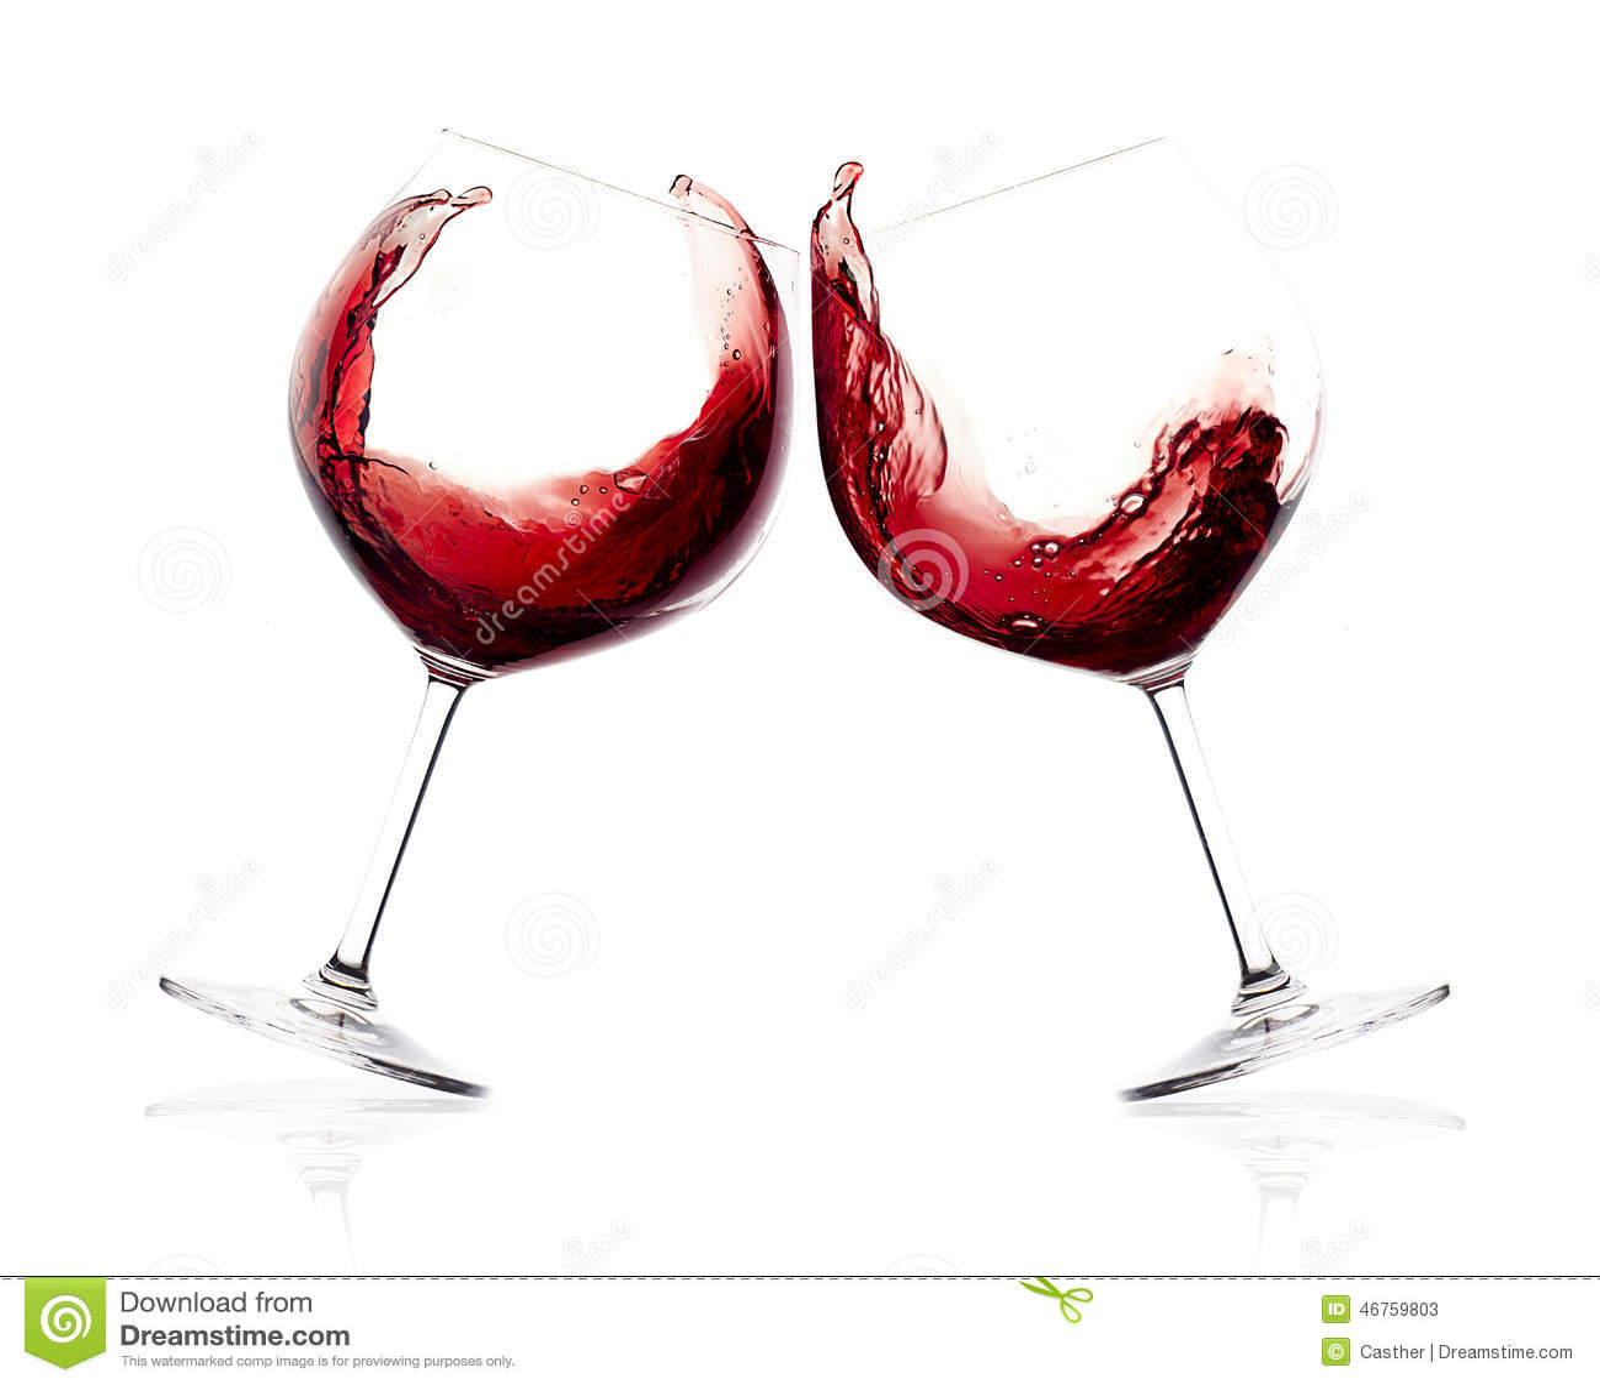 Wine  News reviews amp advice  The Telegraph Food amp Wine